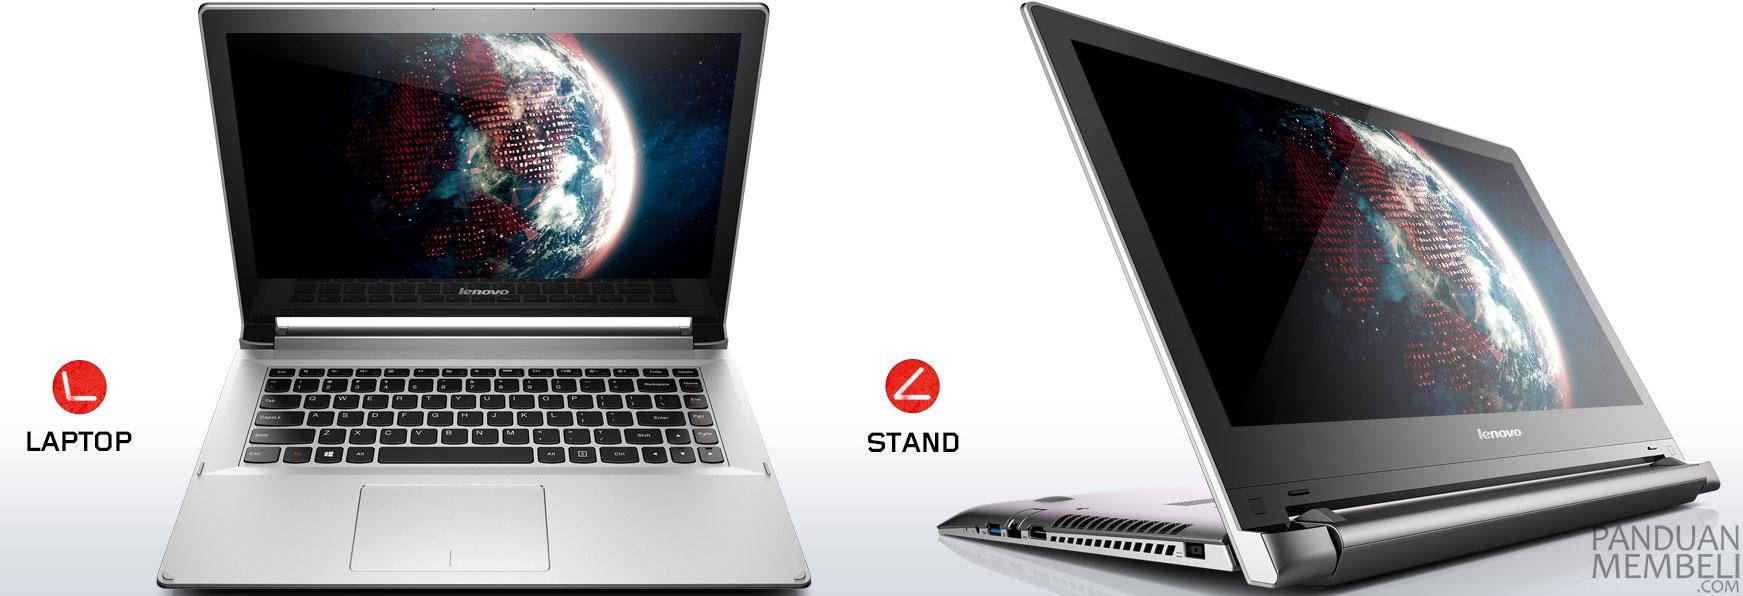 Kelebihan dan Kelemahan Lenovo Flex 2